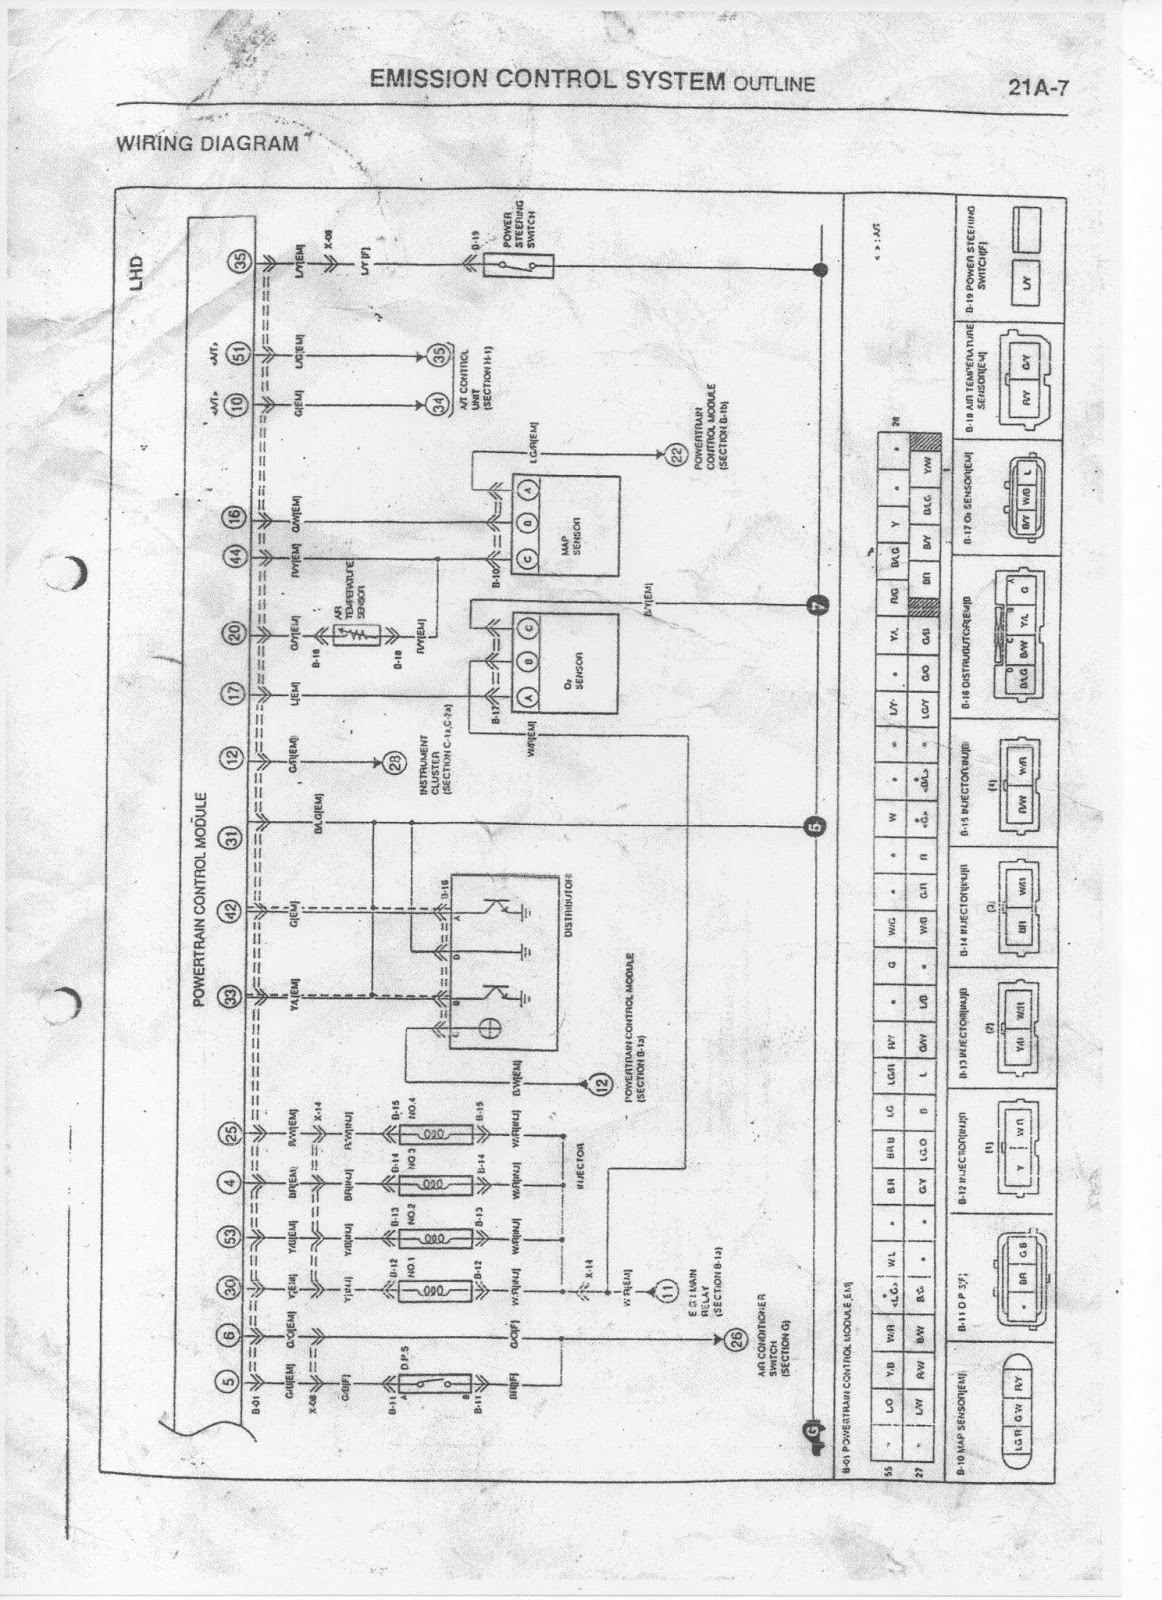 Wiring diagram efi toyota avanza wiring diagram avanza wiring diagram asfbconference2016 Gallery